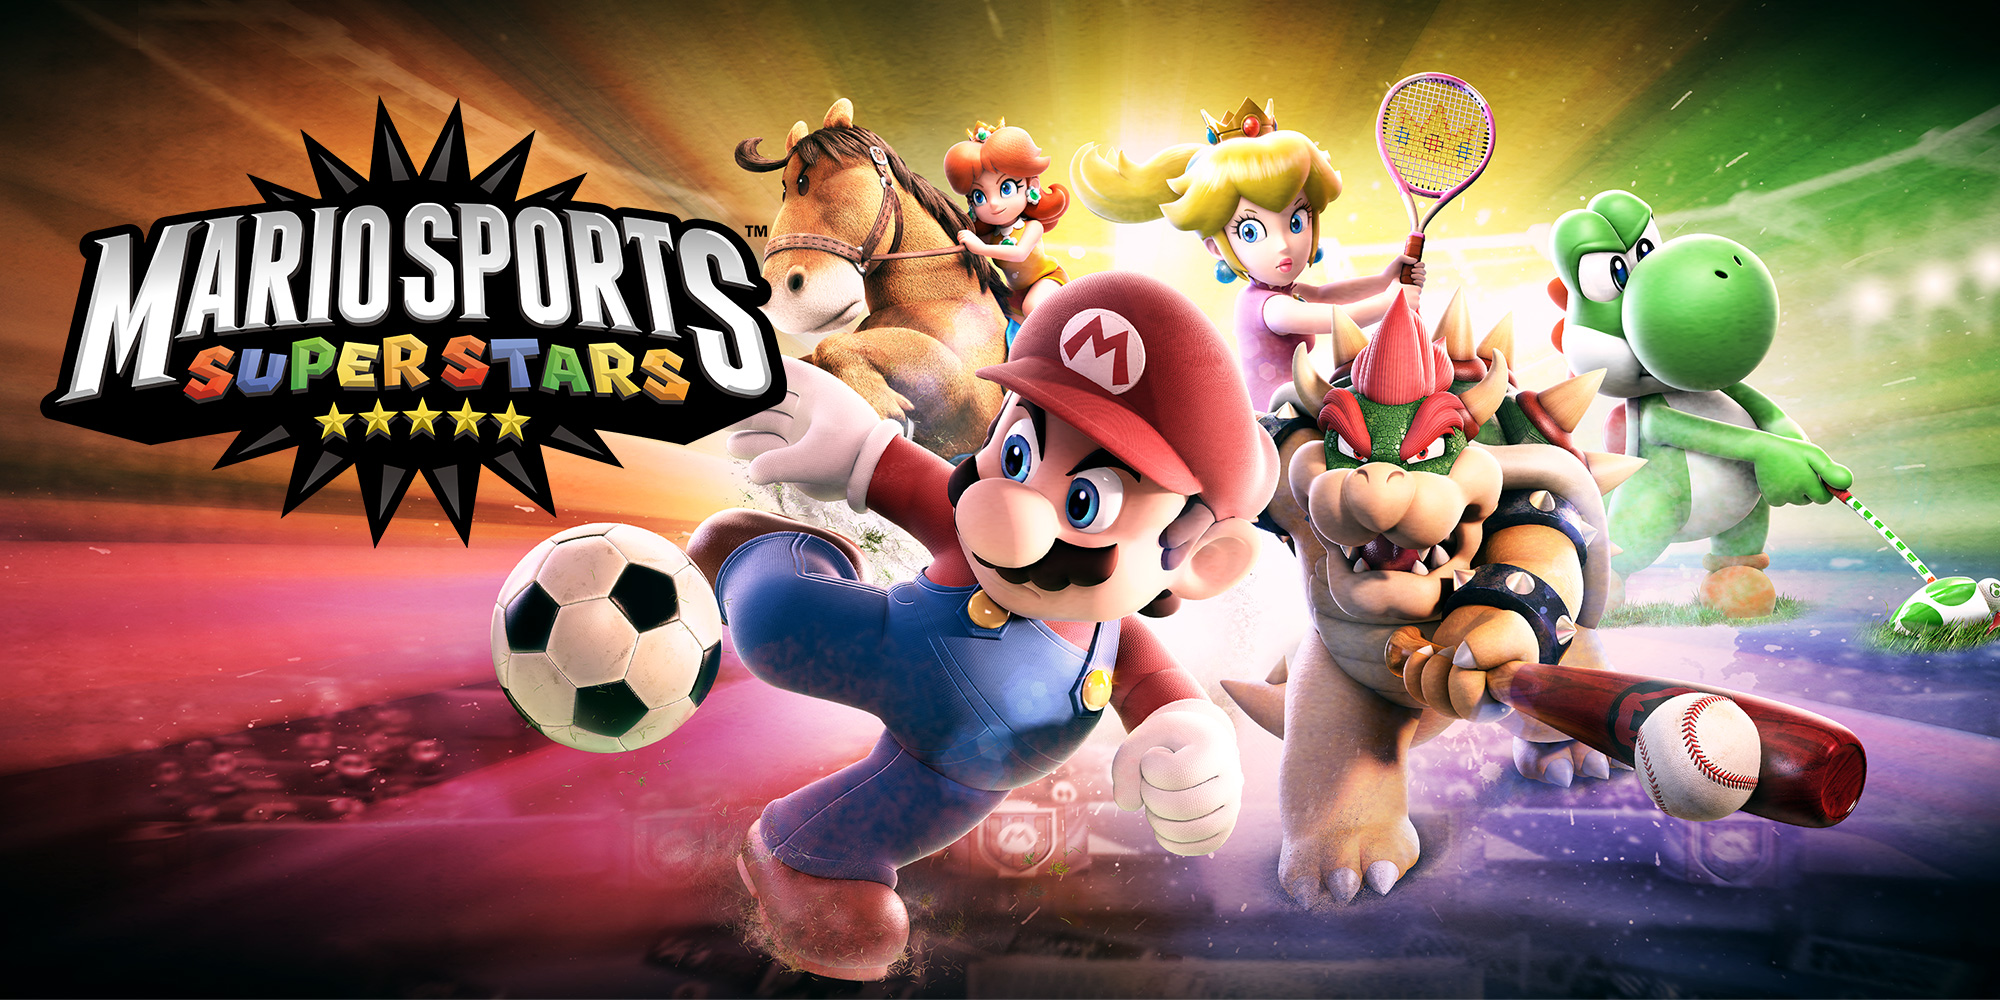 Super Metroid Hd Wallpaper Mario Sports Superstars Nintendo 3ds Giochi Nintendo